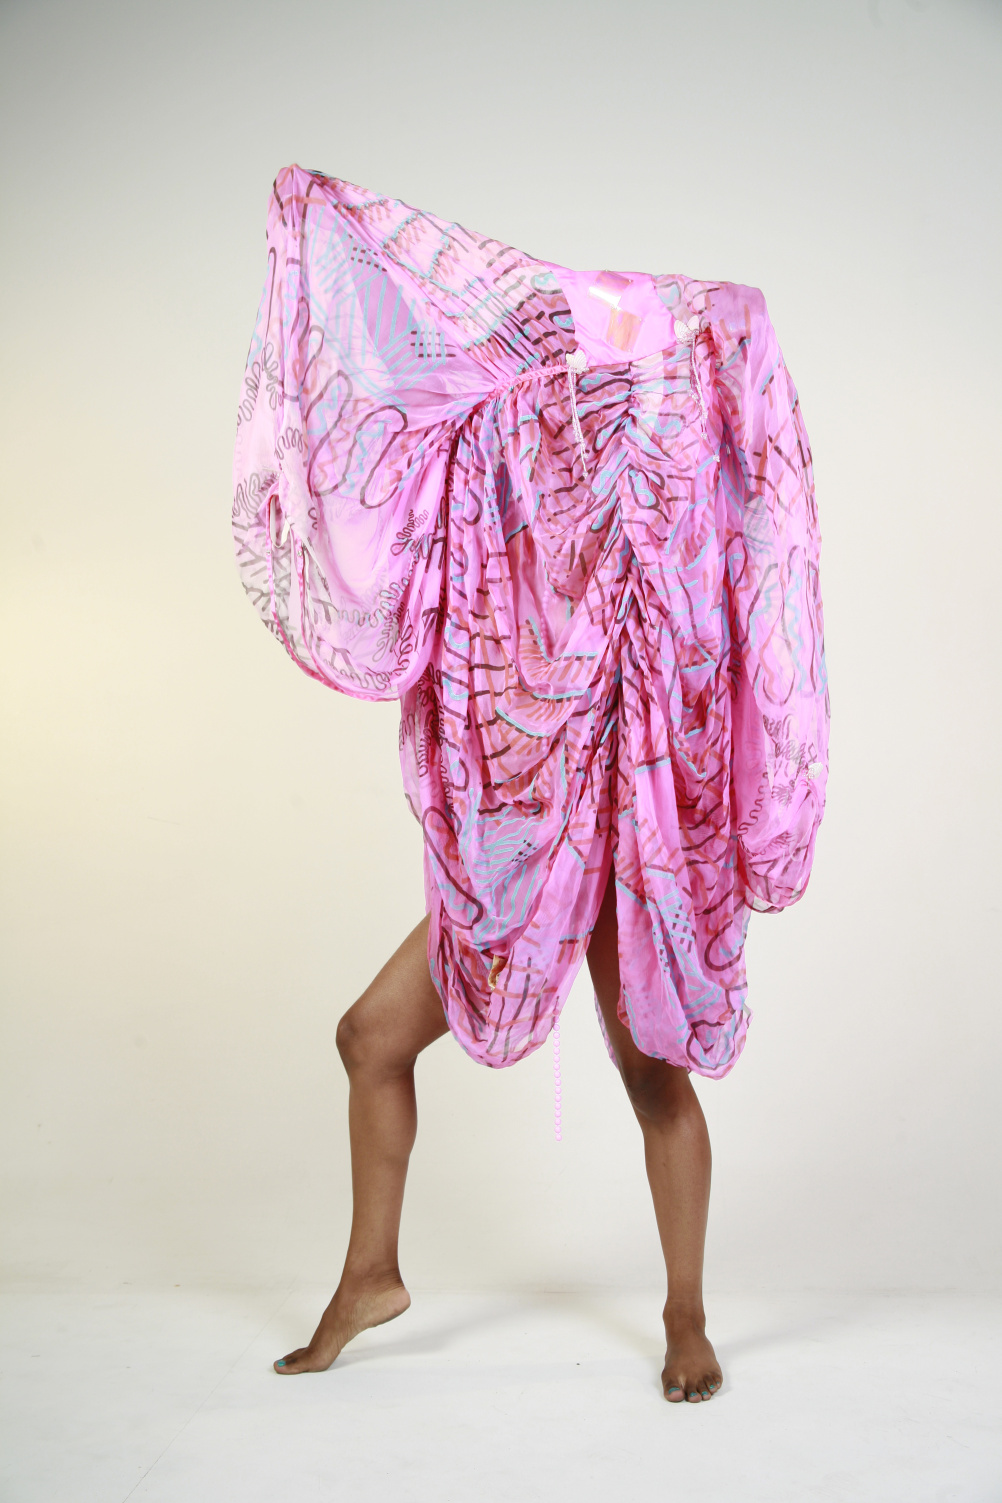 Tameka Norris, A Portrait about Identity, digital print, 2008